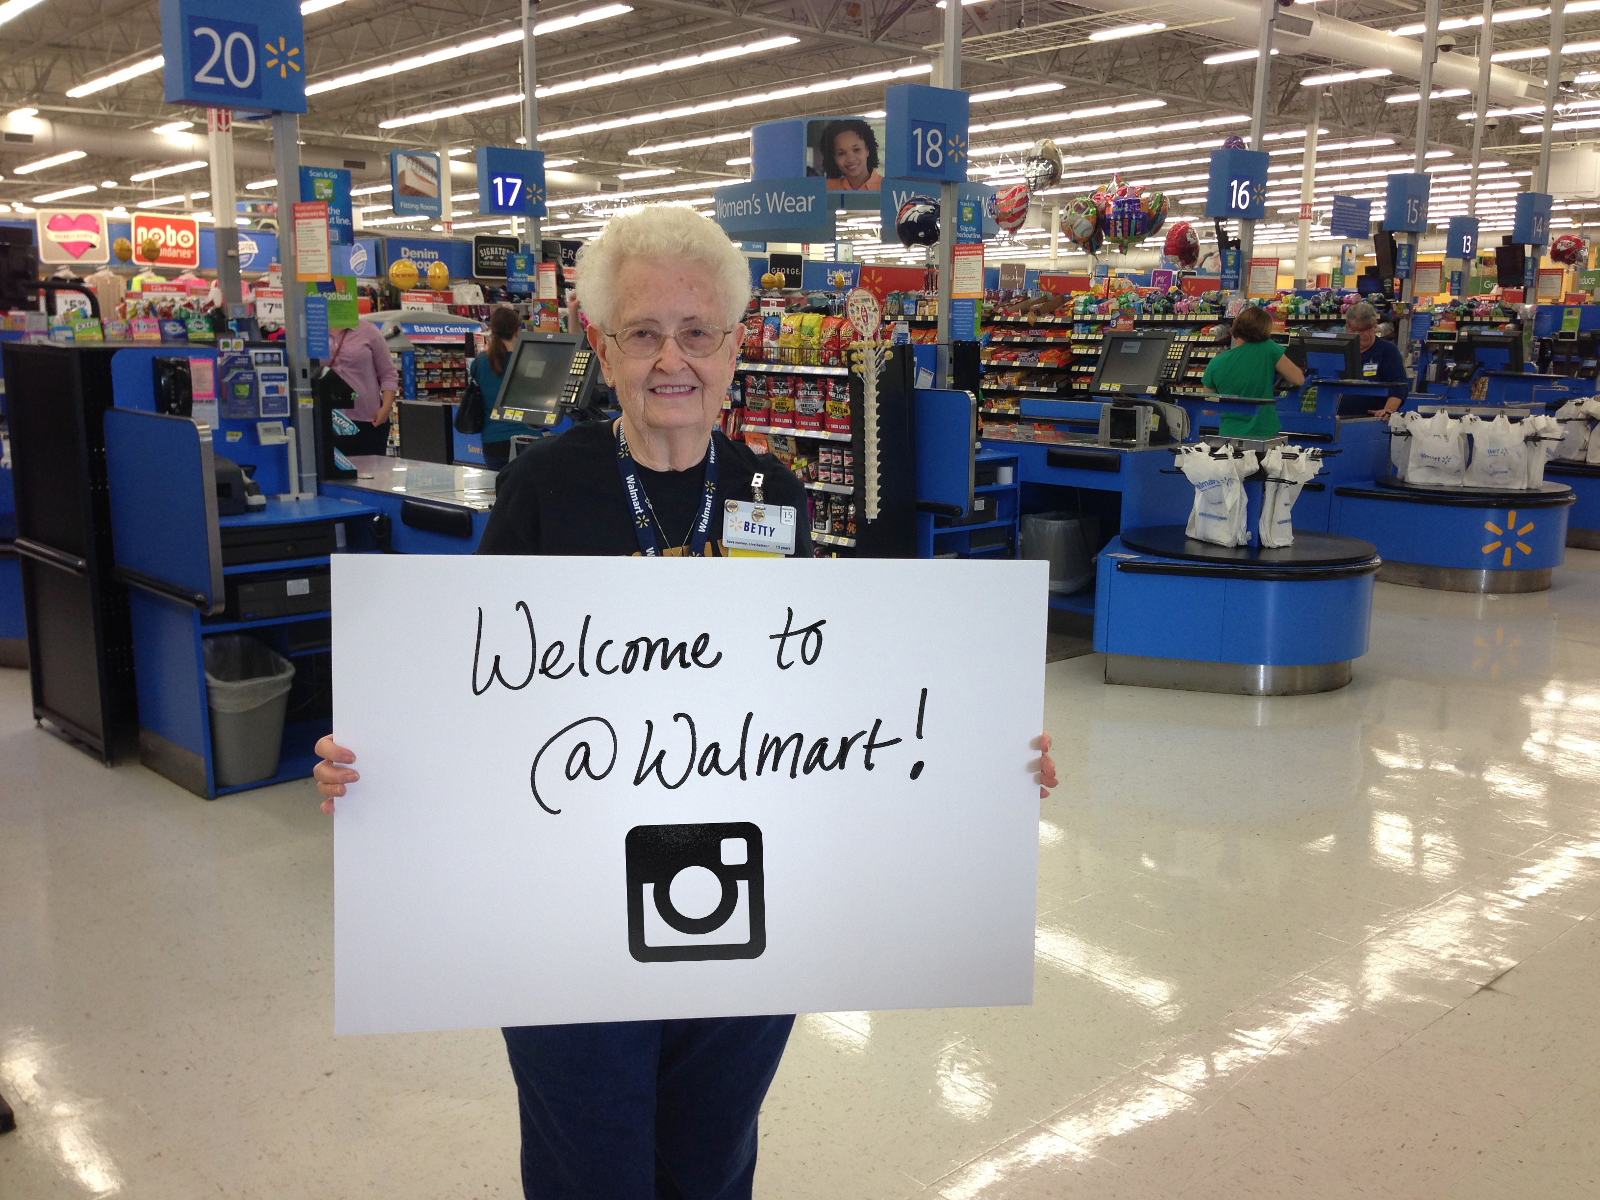 Walmart is on Instagram!